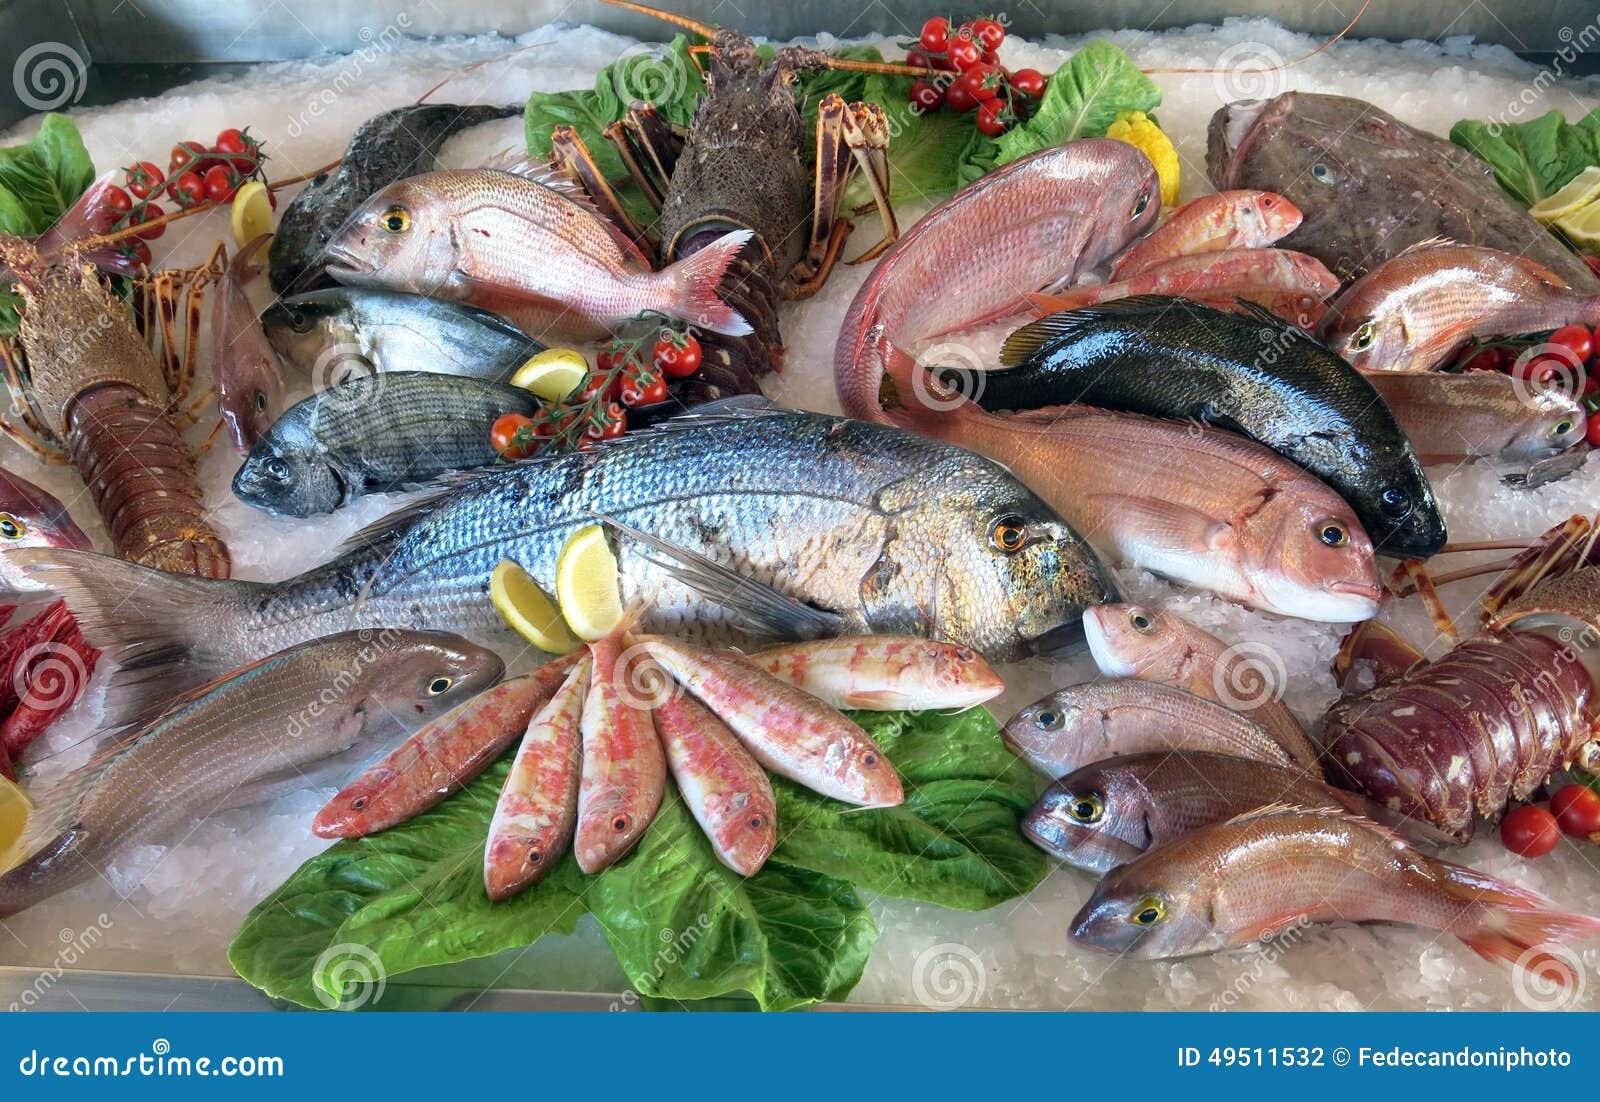 Gran brema de mar blanco mucha peces de agua salada en el - Pagina di colorazione del pesce ...